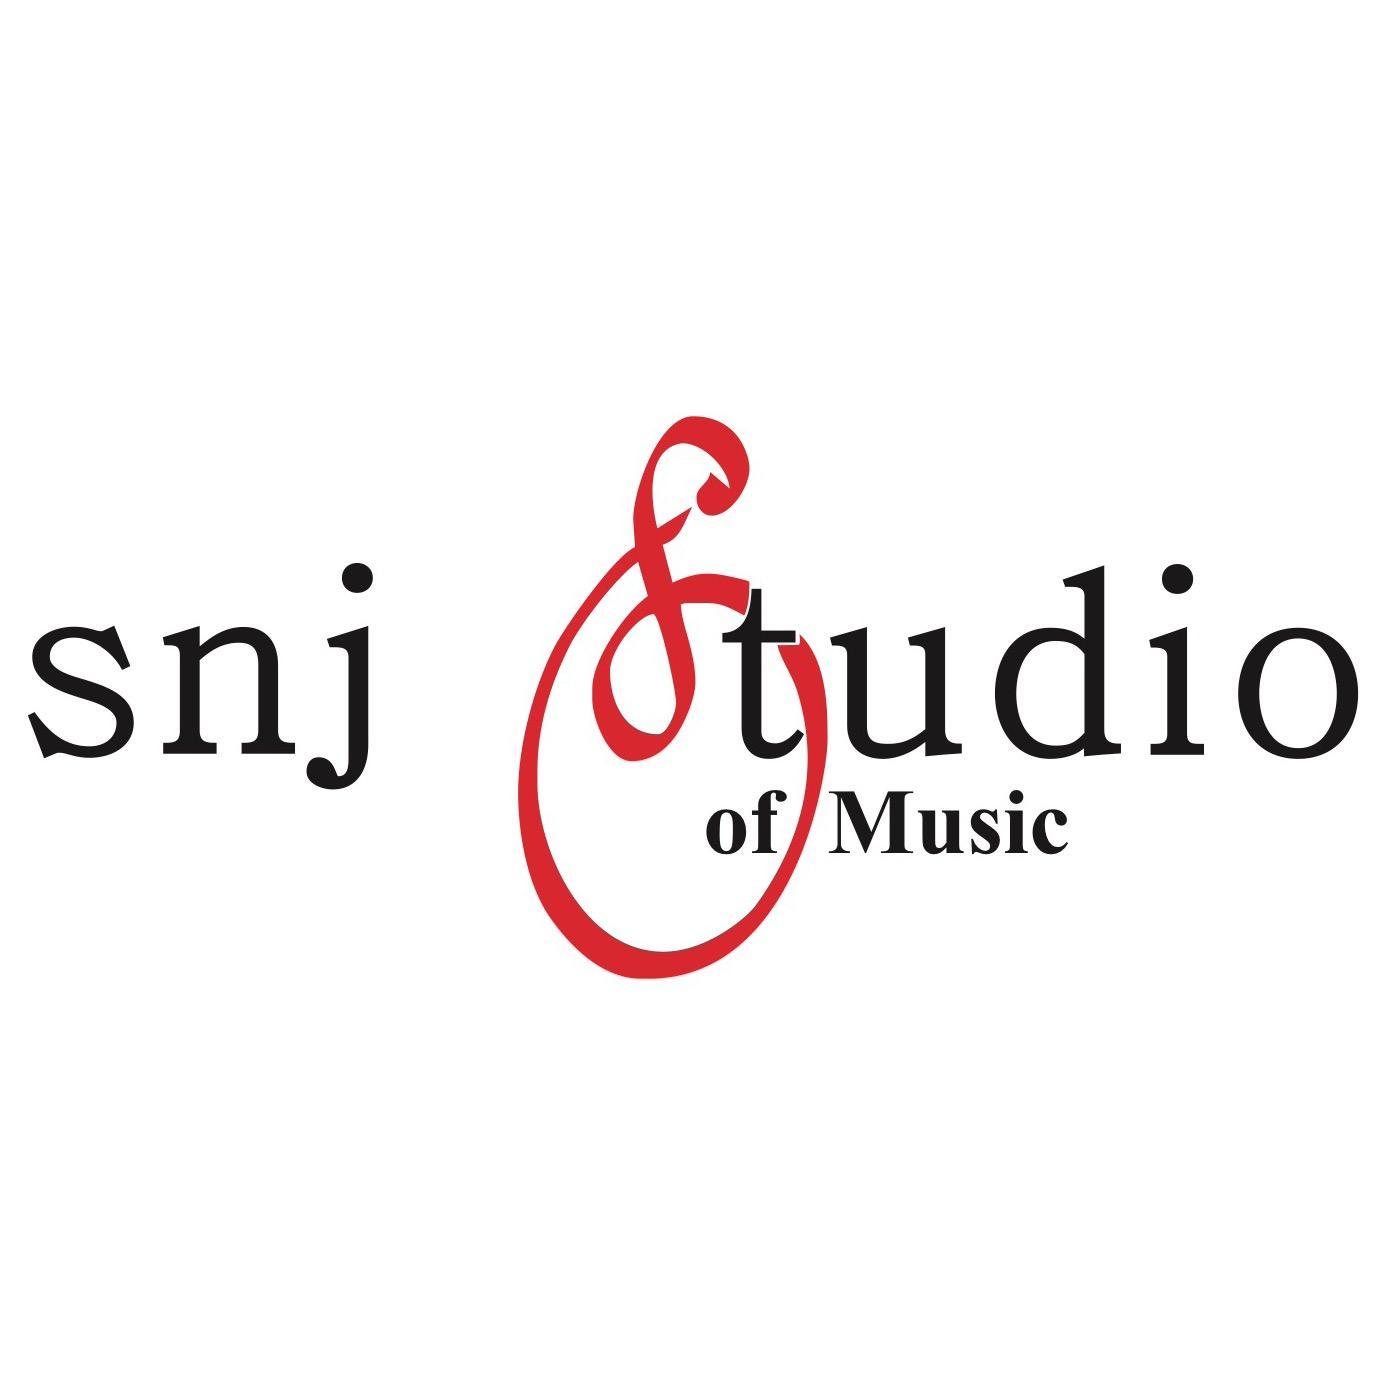 SNJ Studio of Music - Millard - Omaha, NE 68137 - (402)933-1326   ShowMeLocal.com